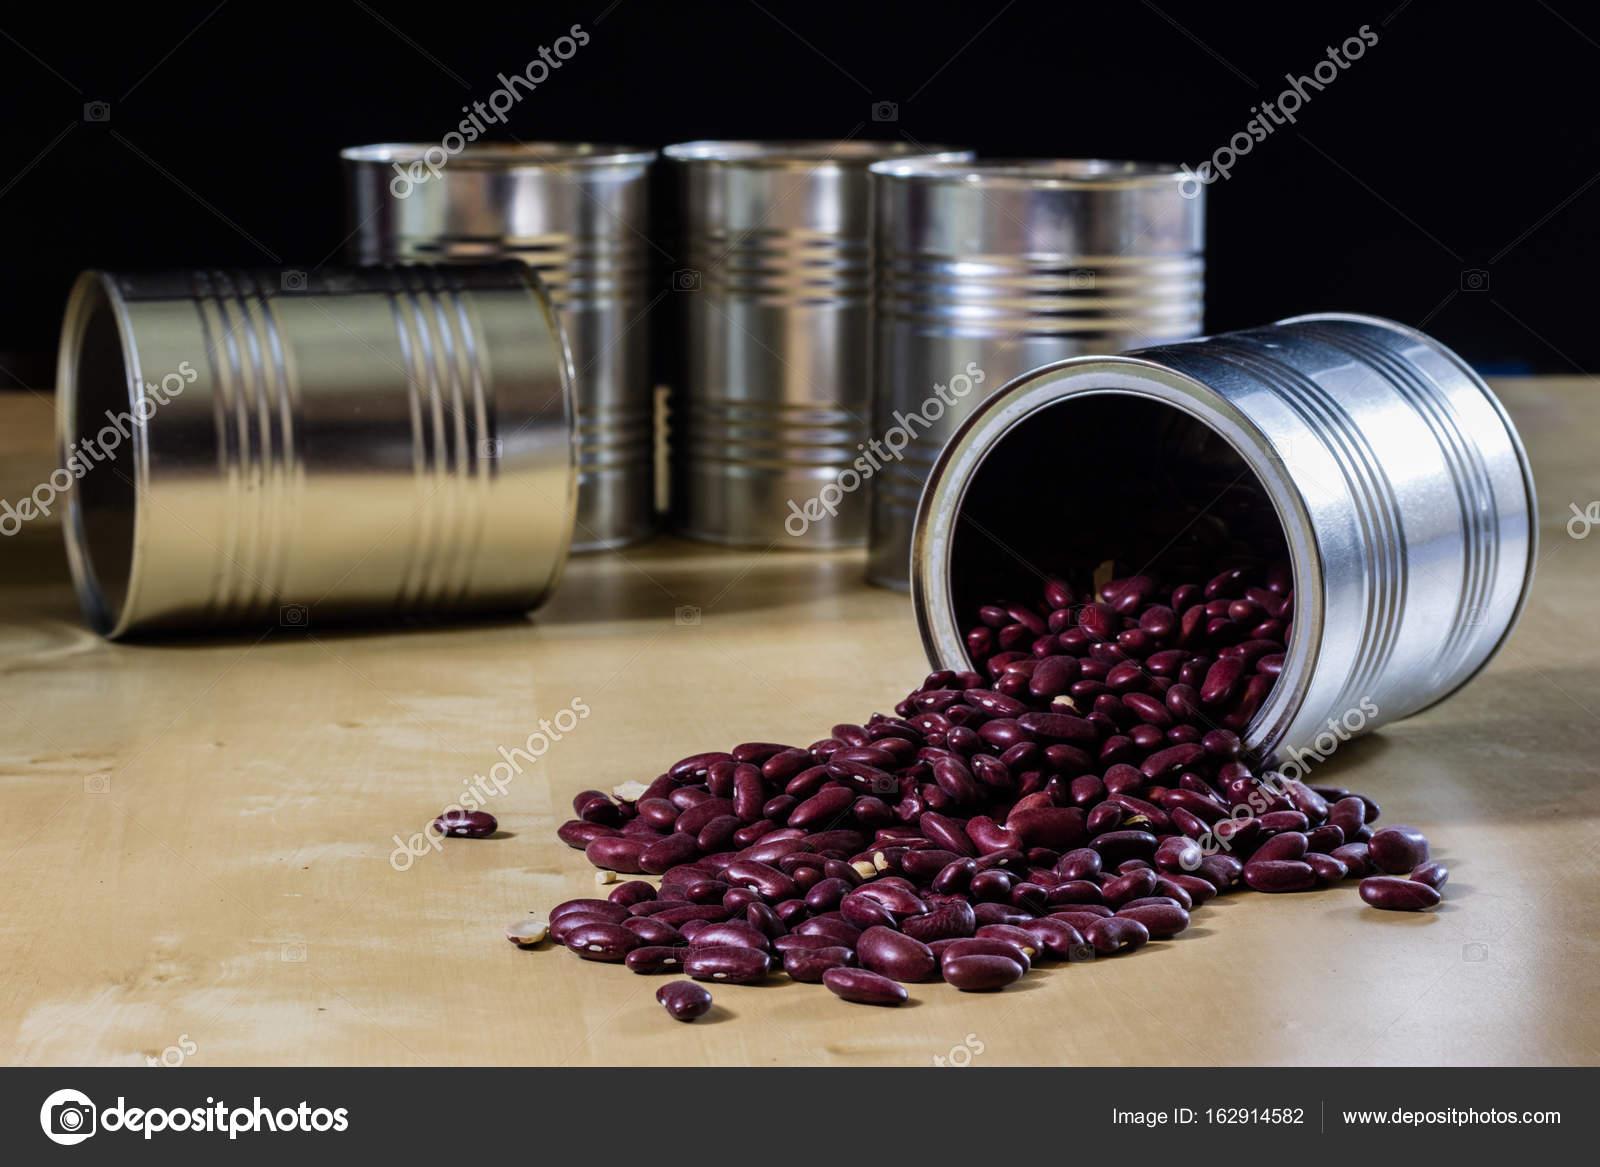 metal kitchen tables remodeling ideas on a small budget 在金属罐的木制厨房桌子上的美味豆 图库照片 c piotrek wytrazek pl